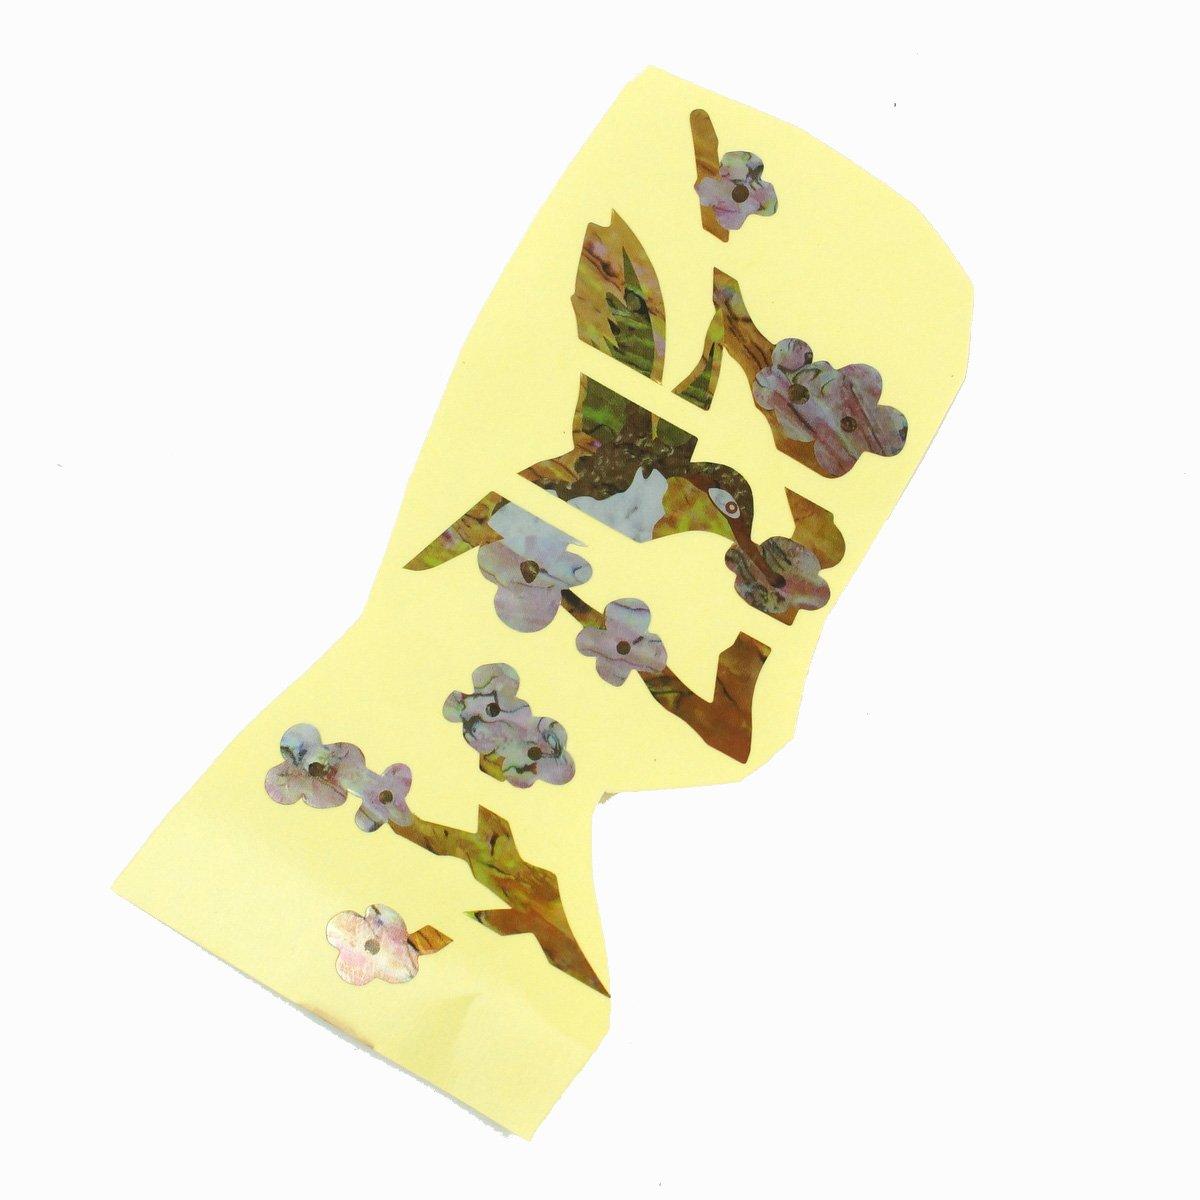 Fretboard Markers Inlay Sticker Decal for Guitar & Bass ,Ornate Bird & Flower